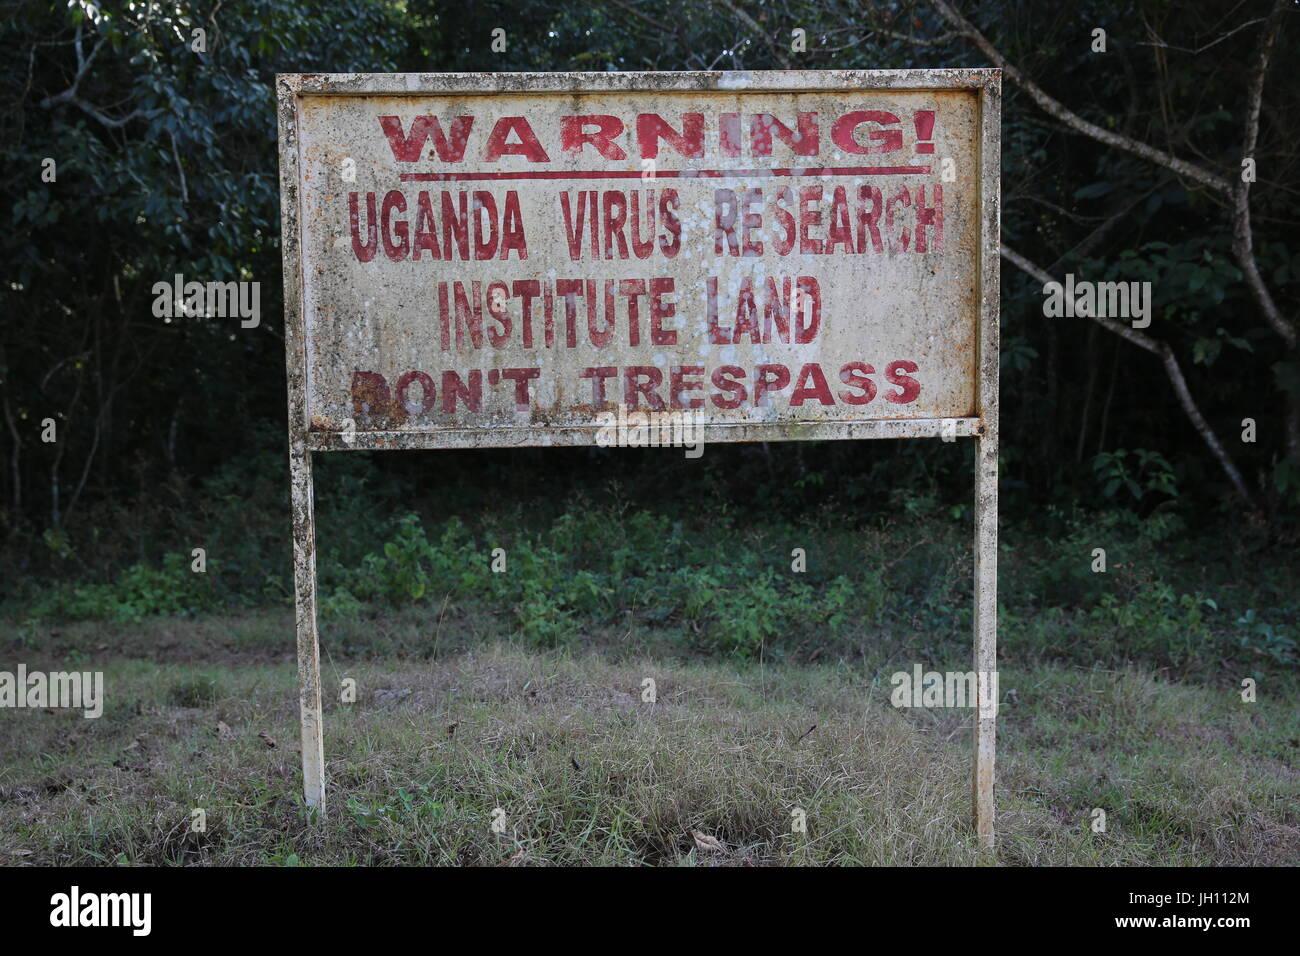 Uganda-Virus Forschung Institure anmelden Zika Wald, Uganda. Uganda. Stockbild